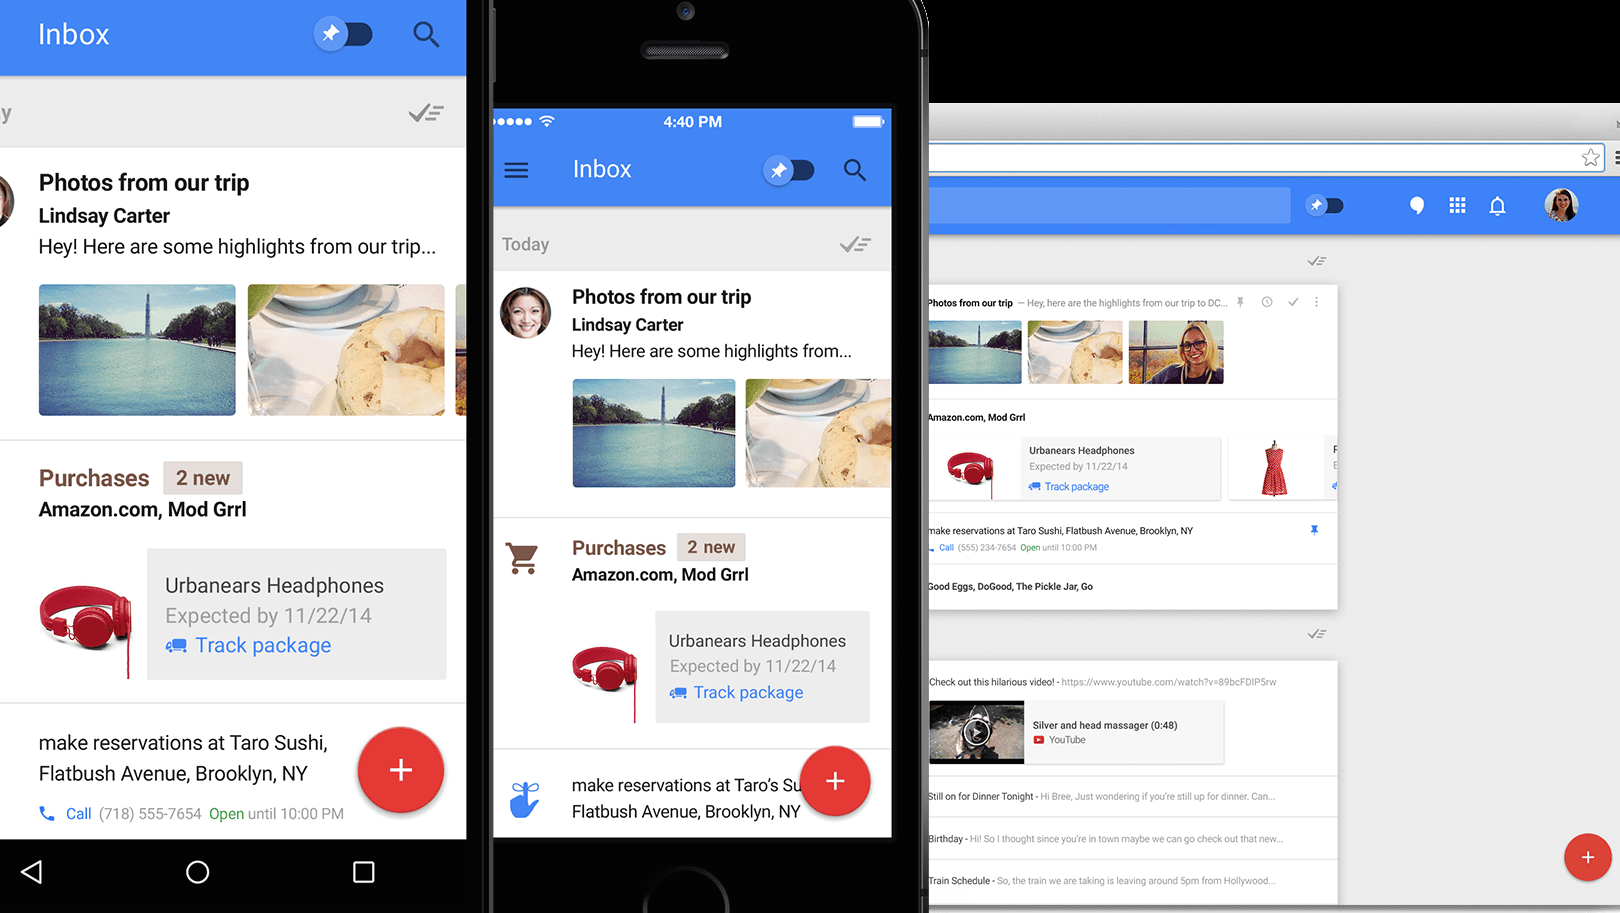 Inbox - chytré emaily podle Googlu